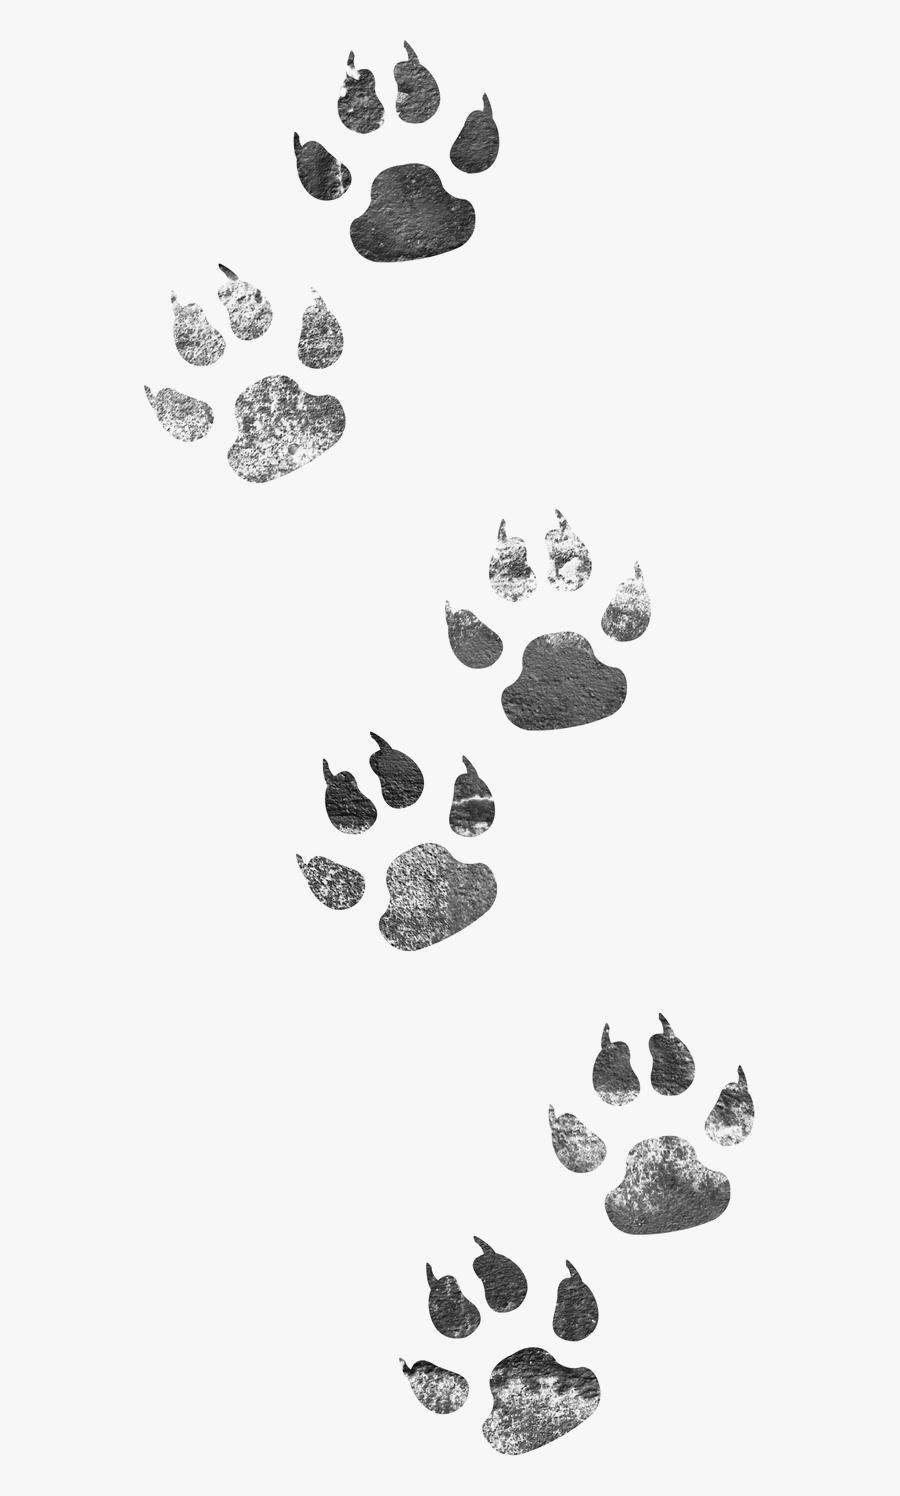 Footprints Dog Cat Png Image High Quality Clipart - Animal Tracks Clip Art, Transparent Clipart